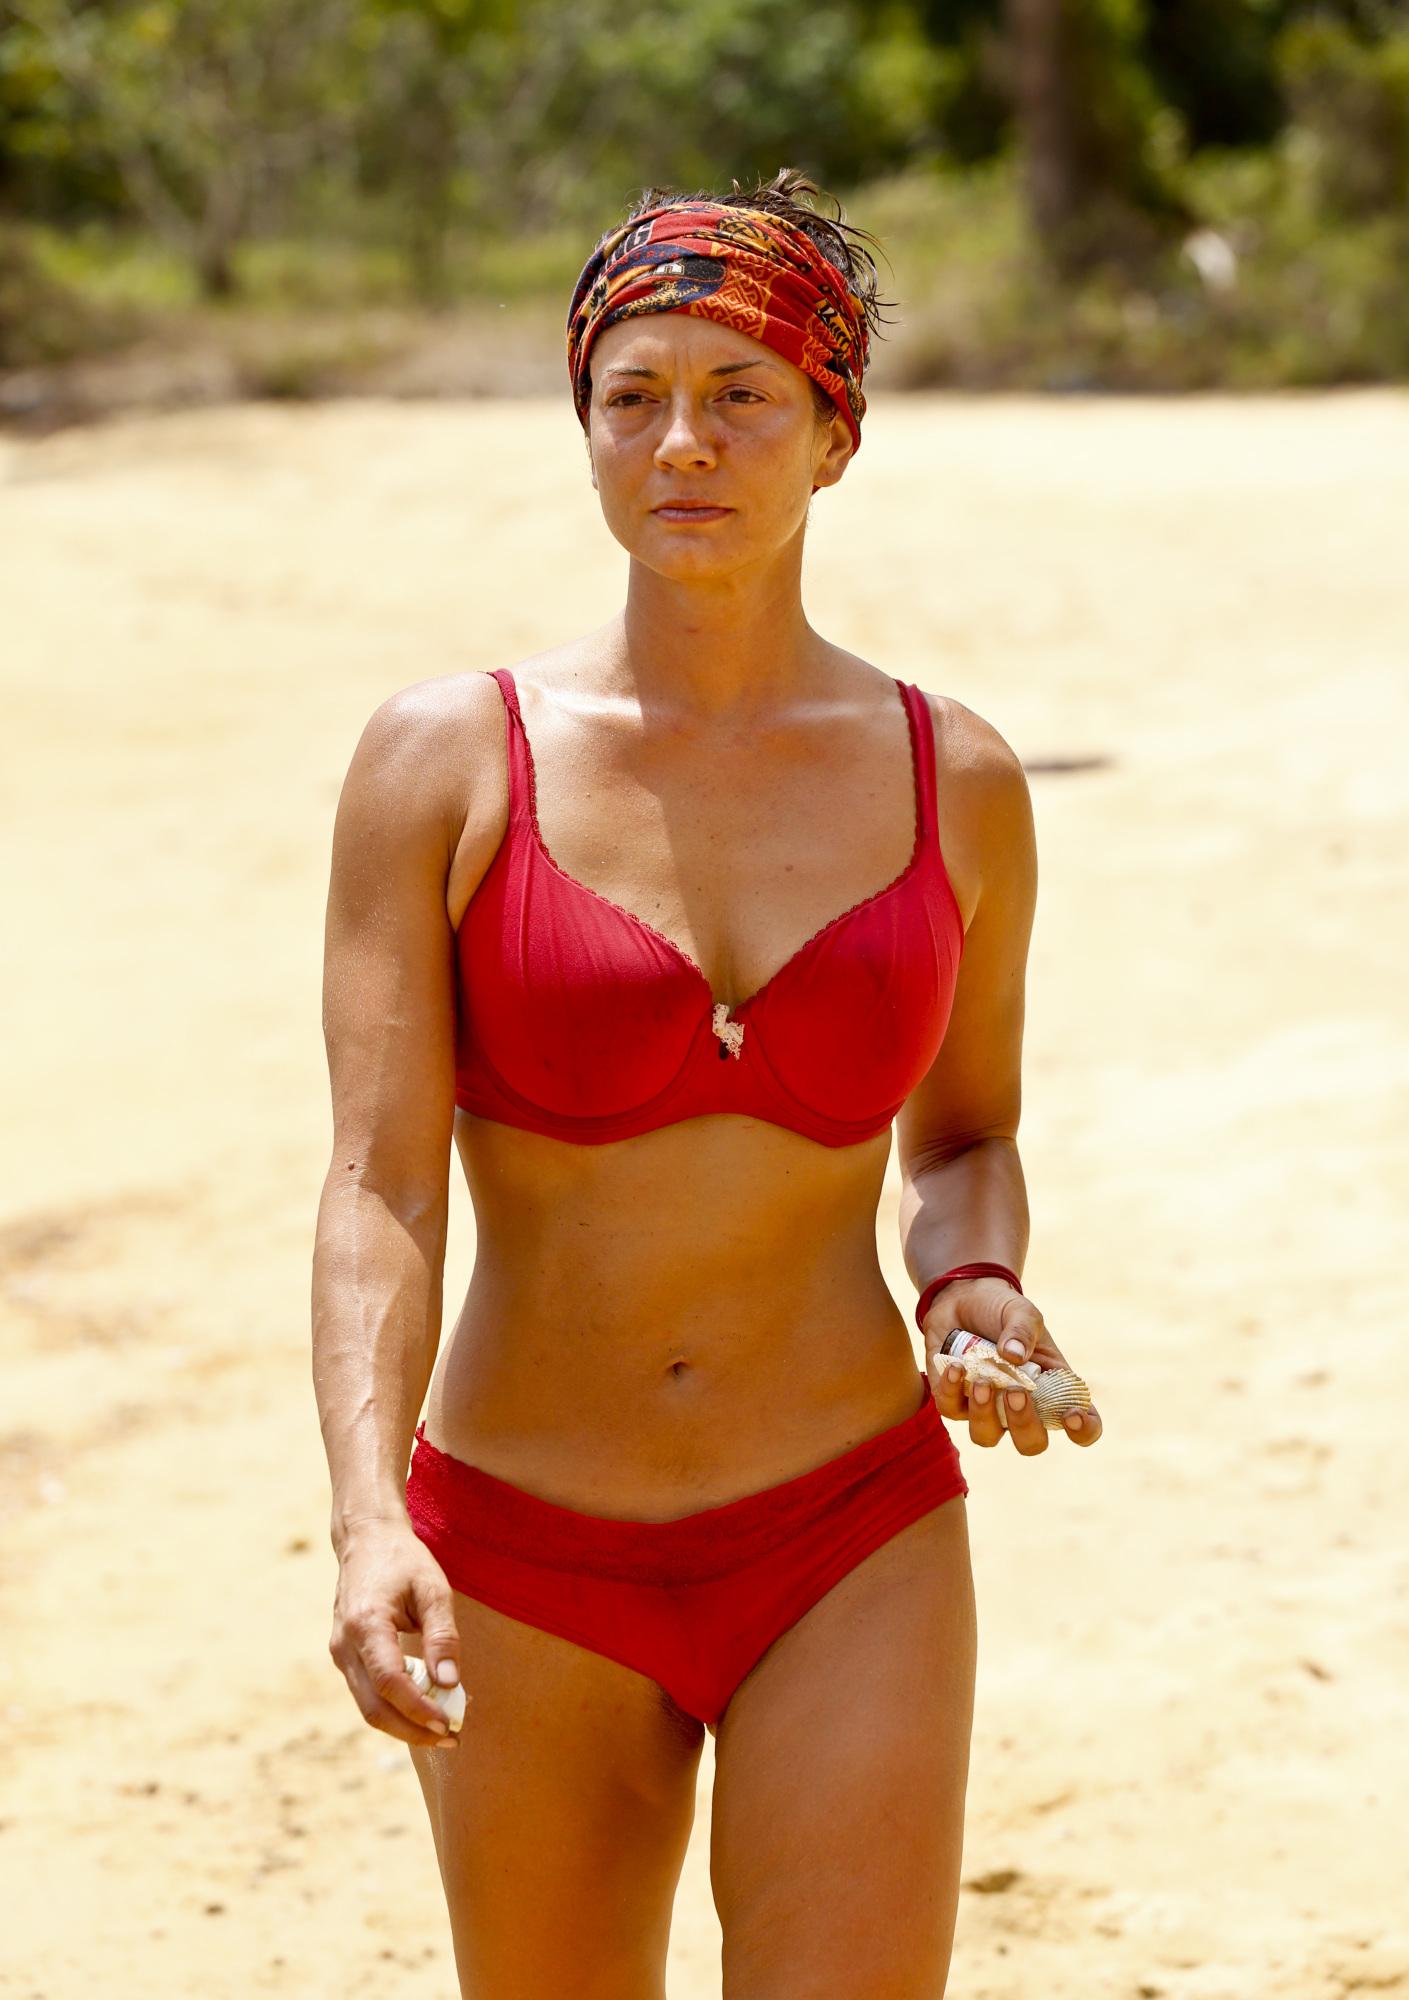 Jennifer Lanzetti at Brawn tribe's camp on Survivor: Kaoh Rong